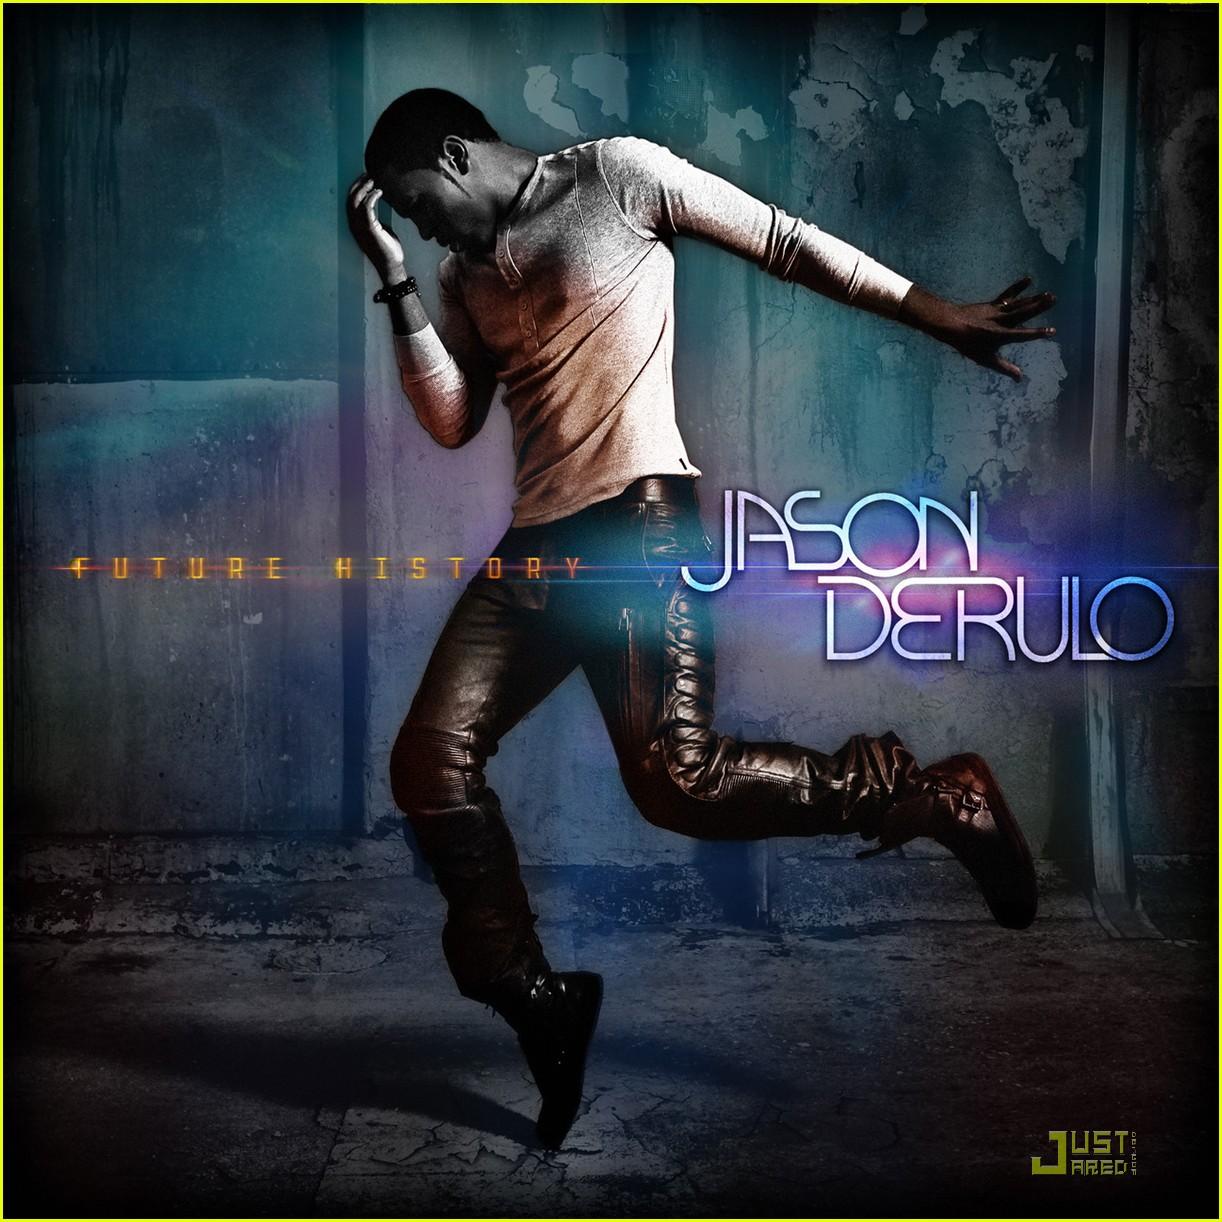 Jason DeRulo Song Lyrics  MetroLyrics